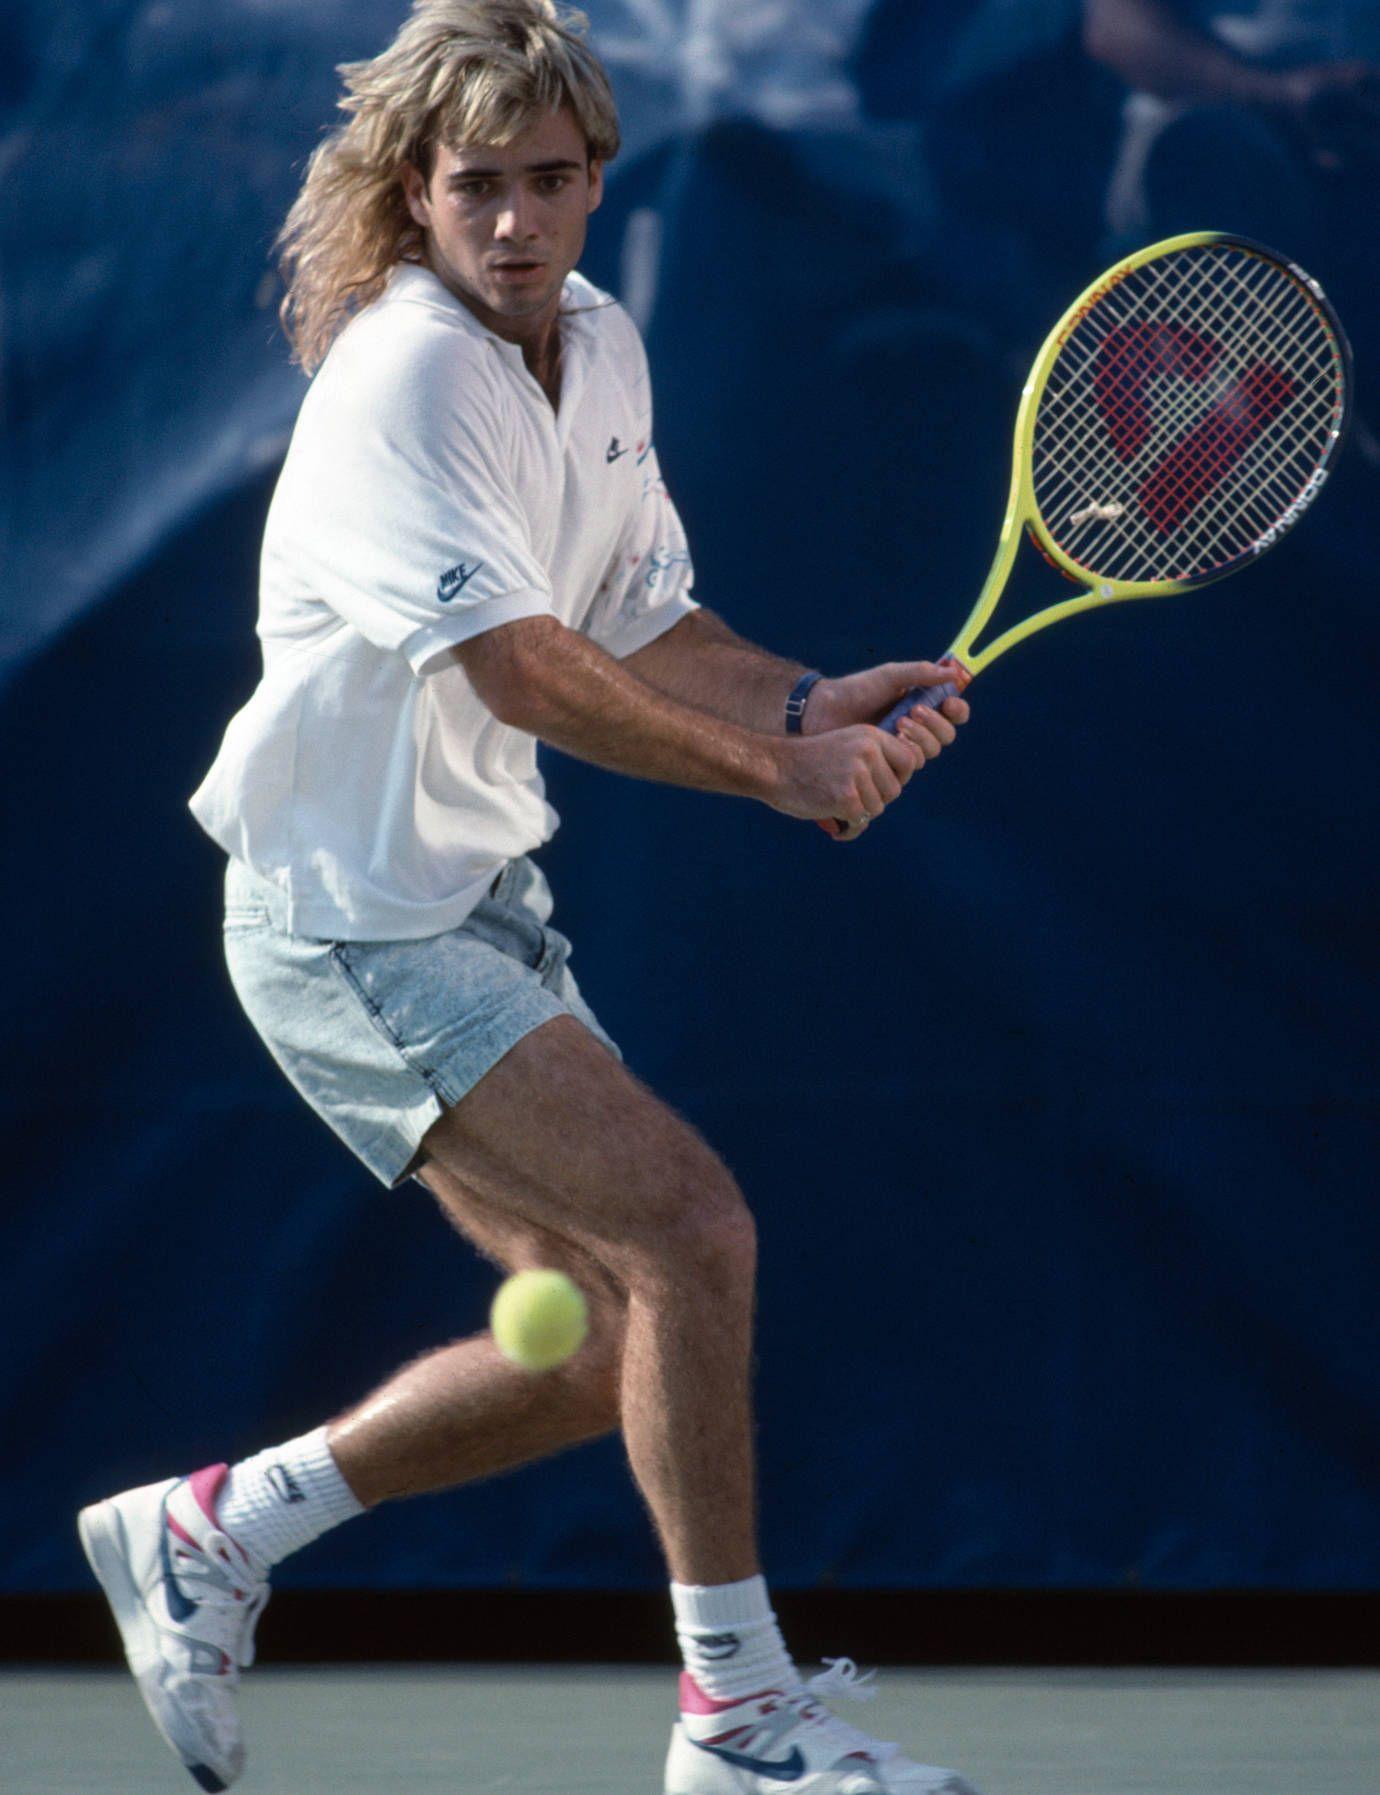 US Open New York Tennis Clothing